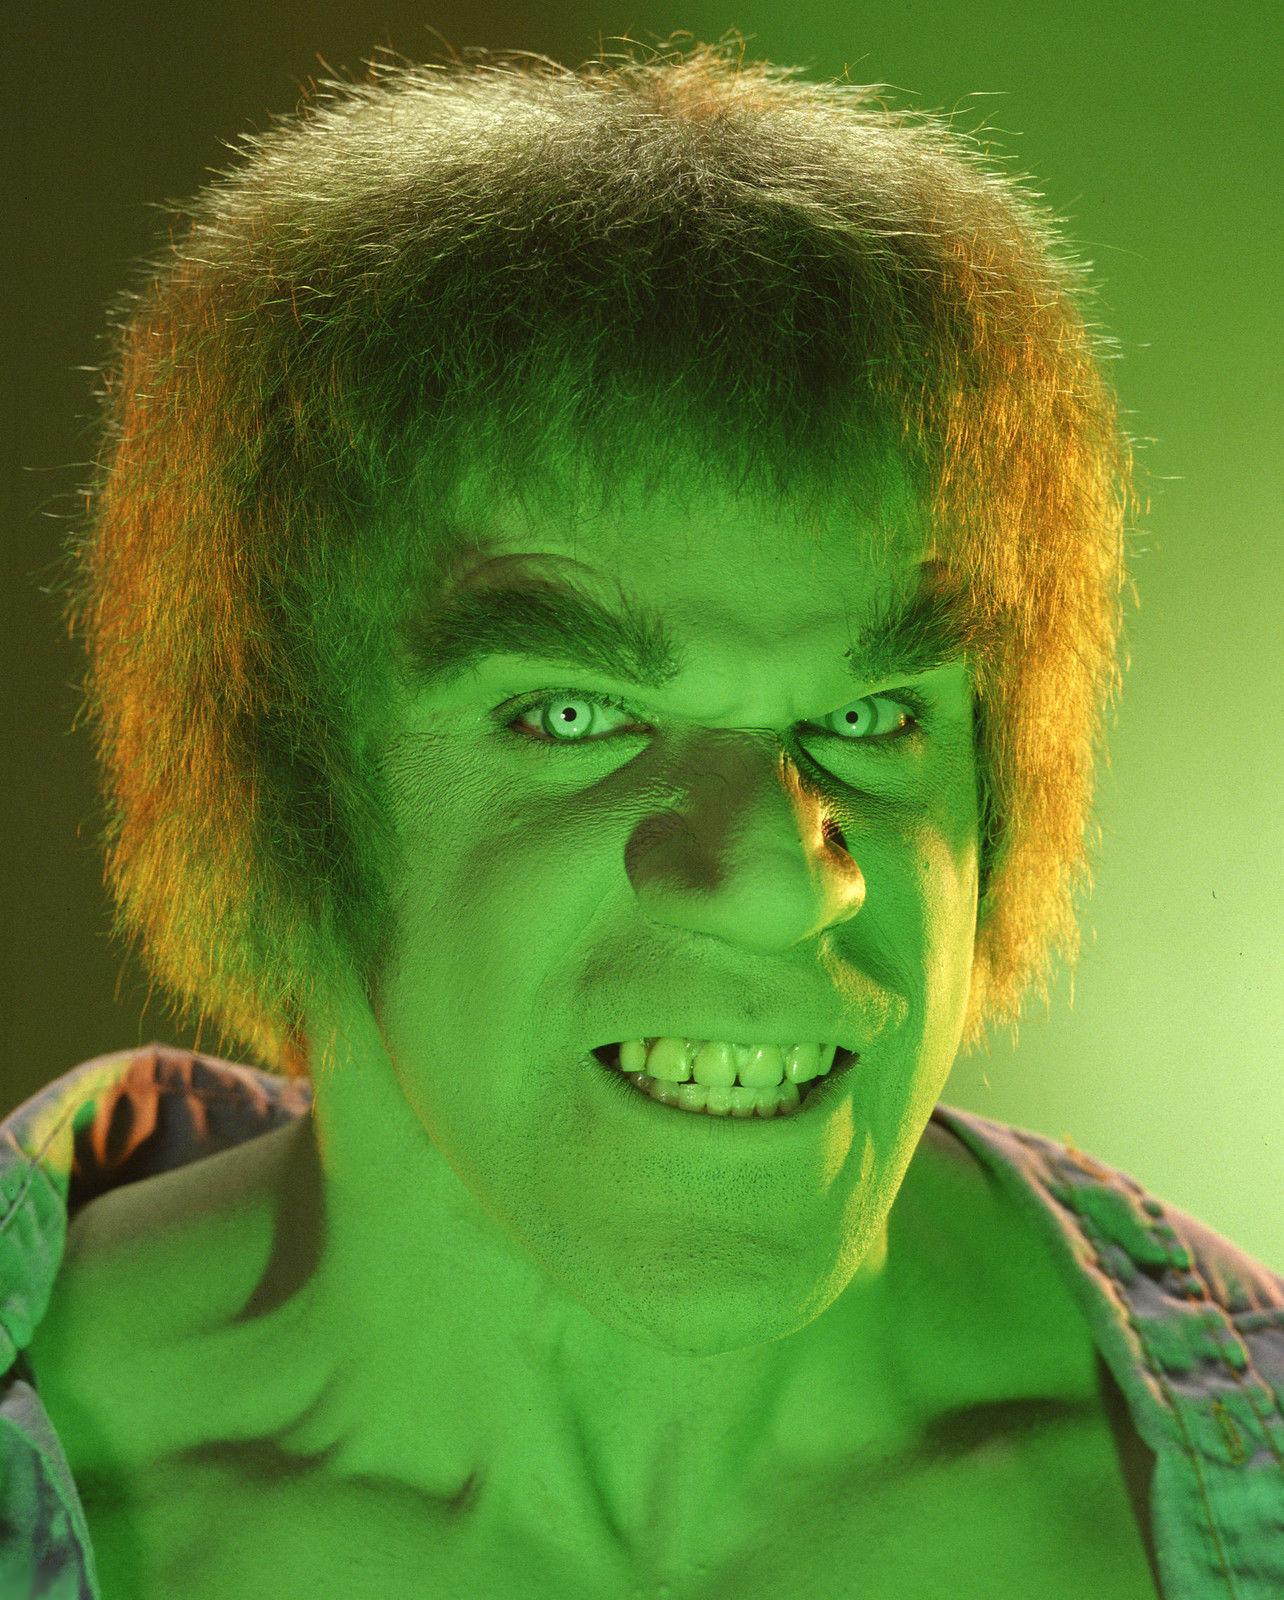 The Incredible Hulk (1978-82 TV series) | Hulk Wiki ...